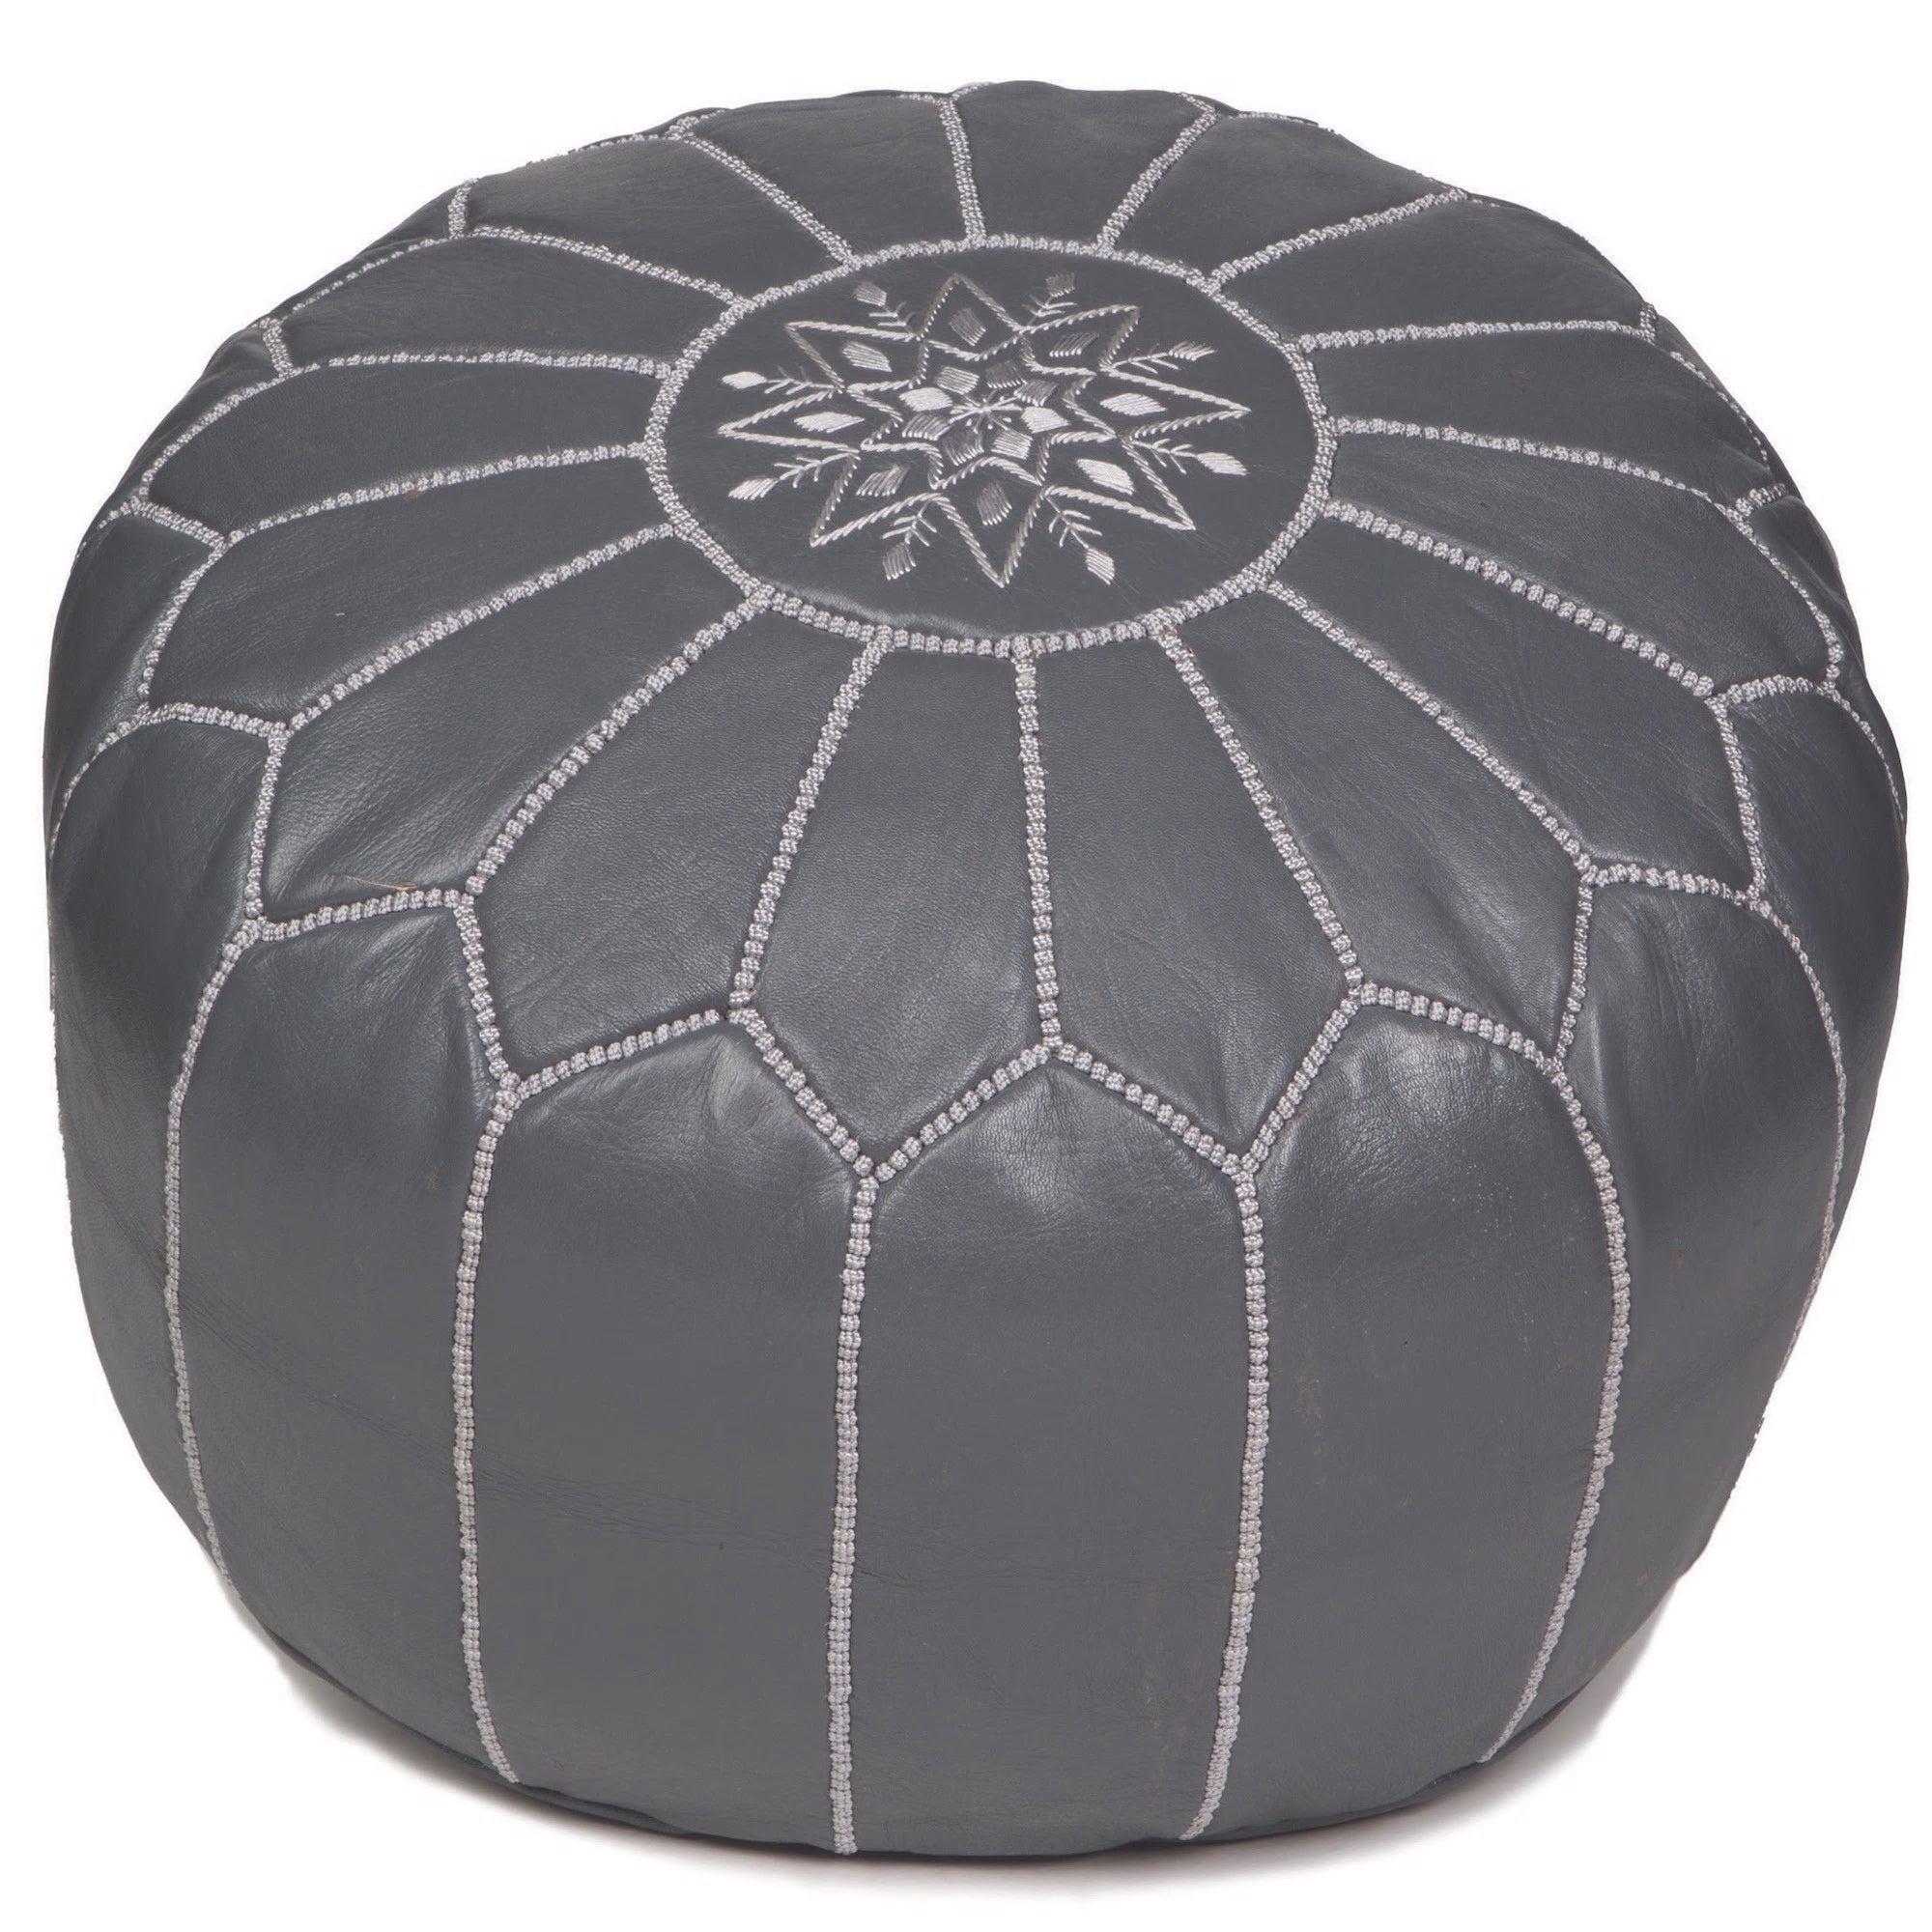 Black  Authentic MOROCCAN POUF Leather Pouf Ottoman Pouffe footst***NEW***